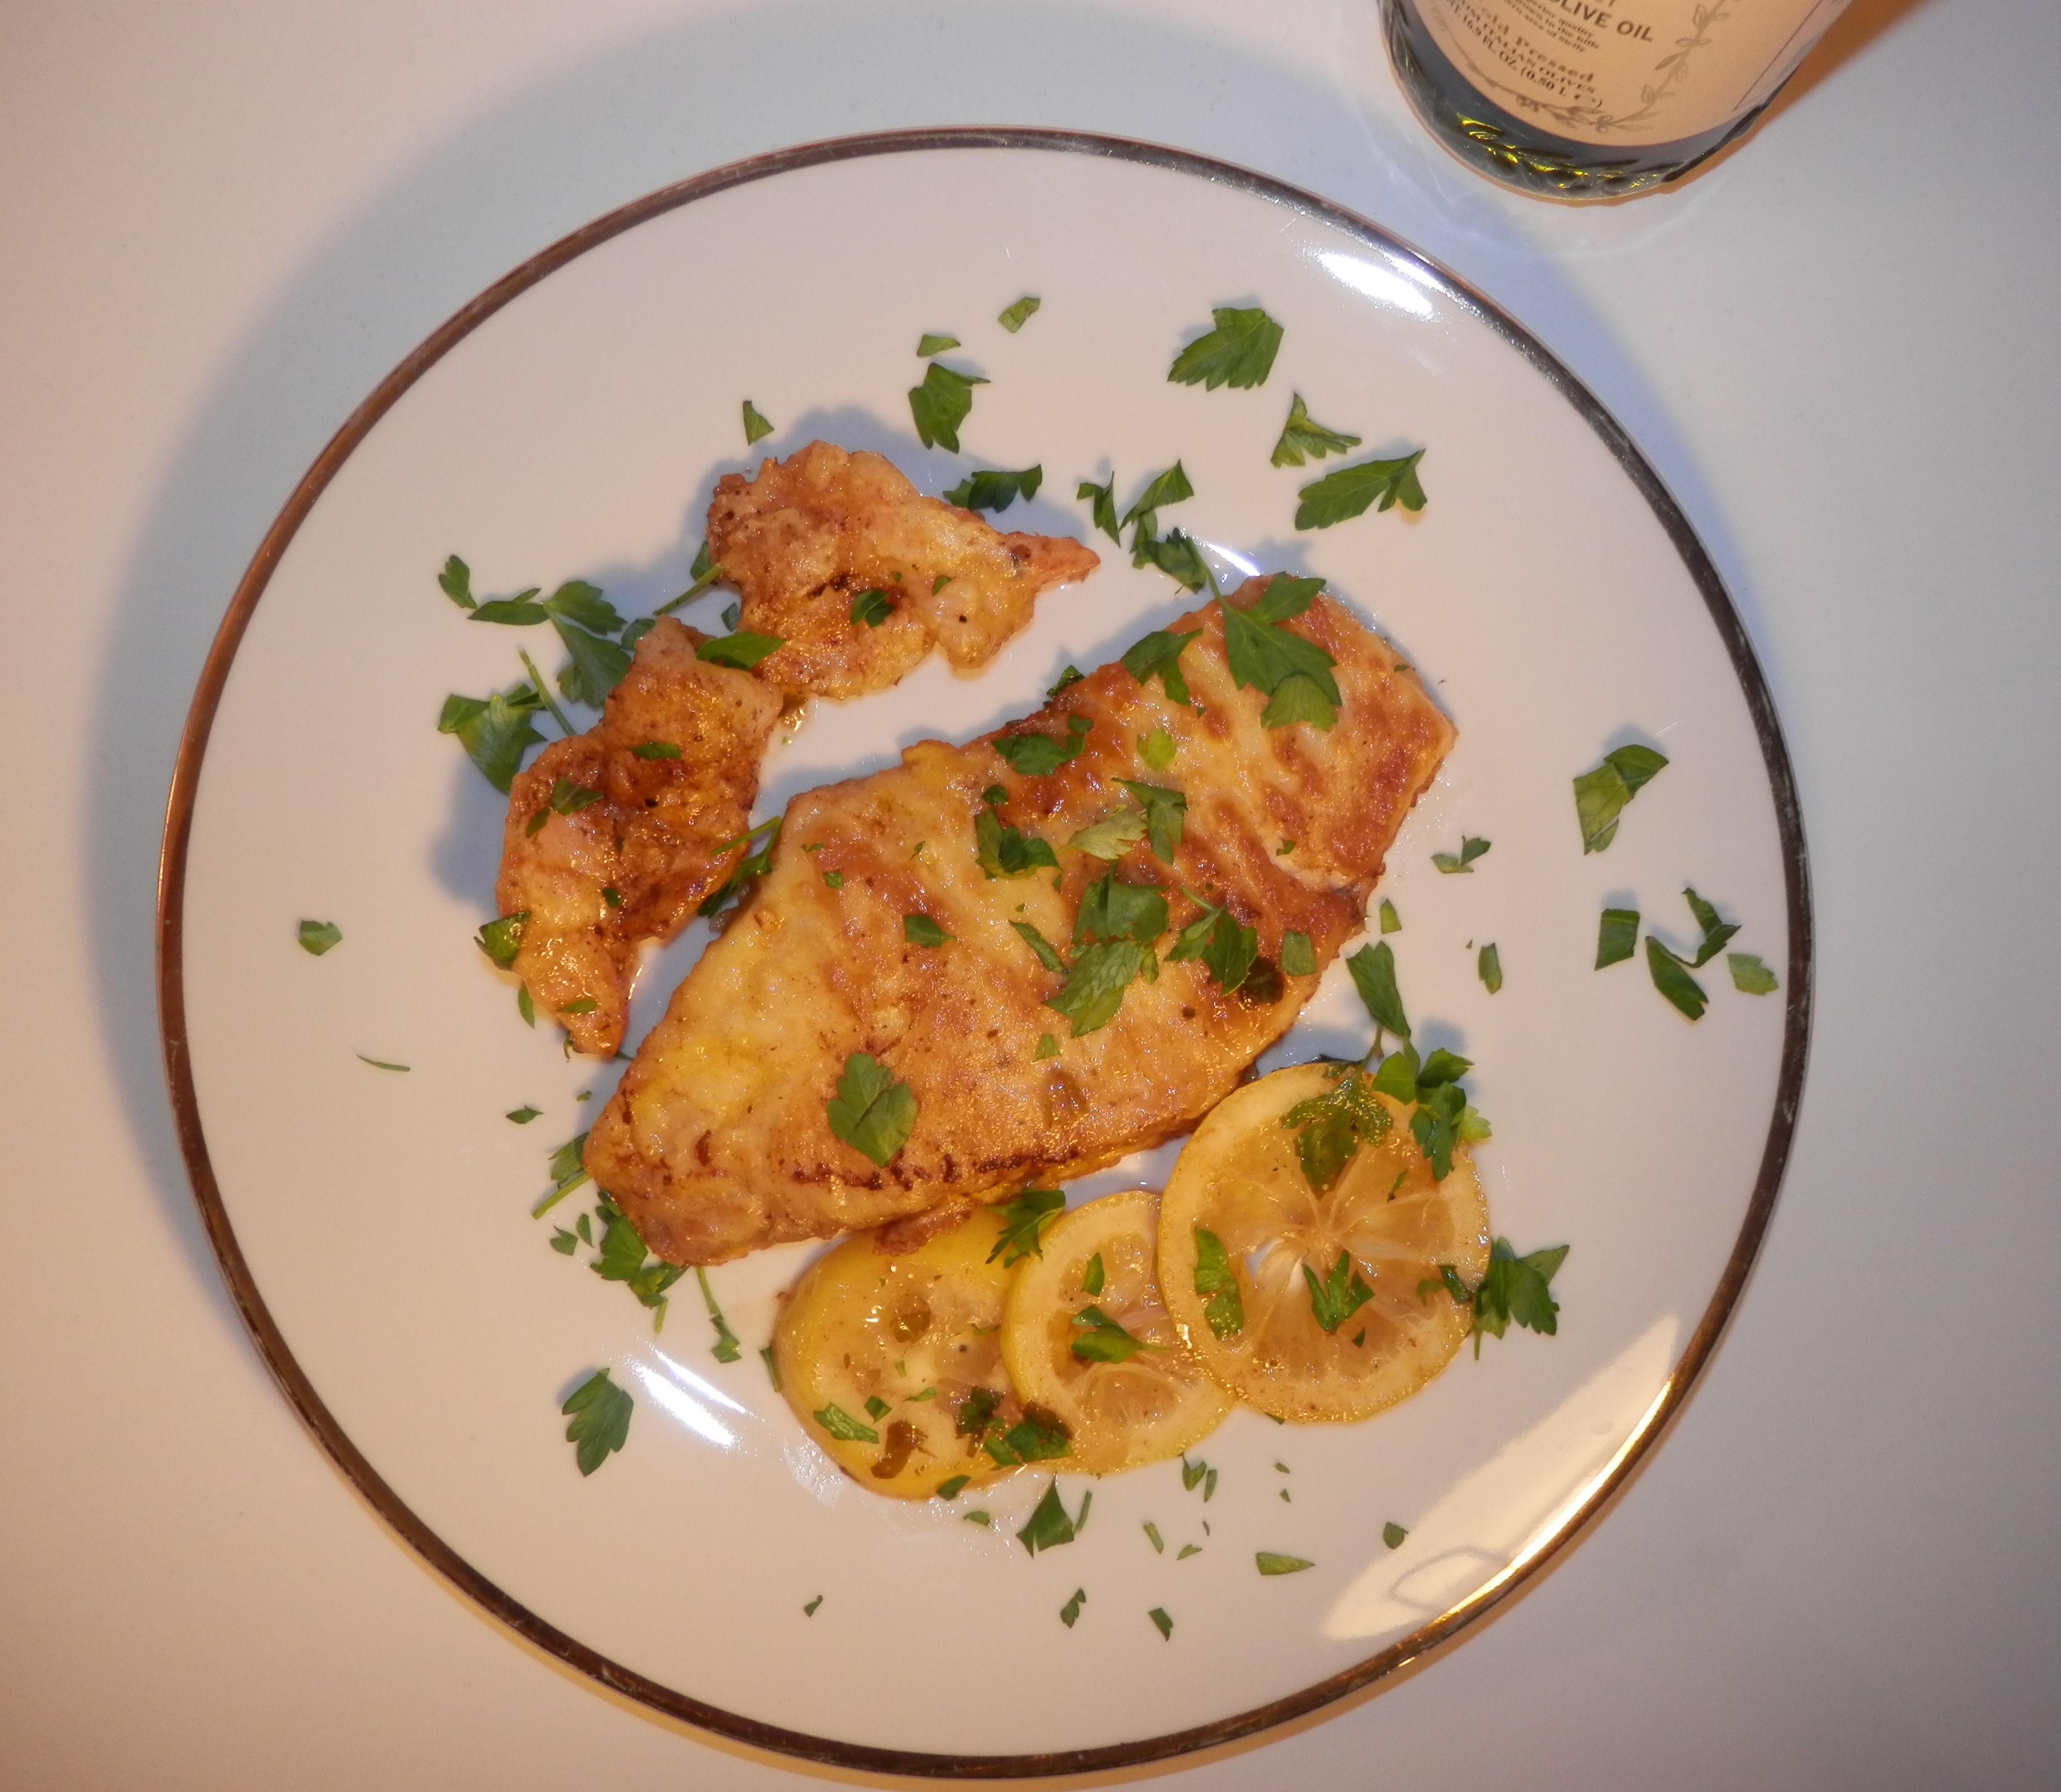 Filet of Sole and Shrimp Francese